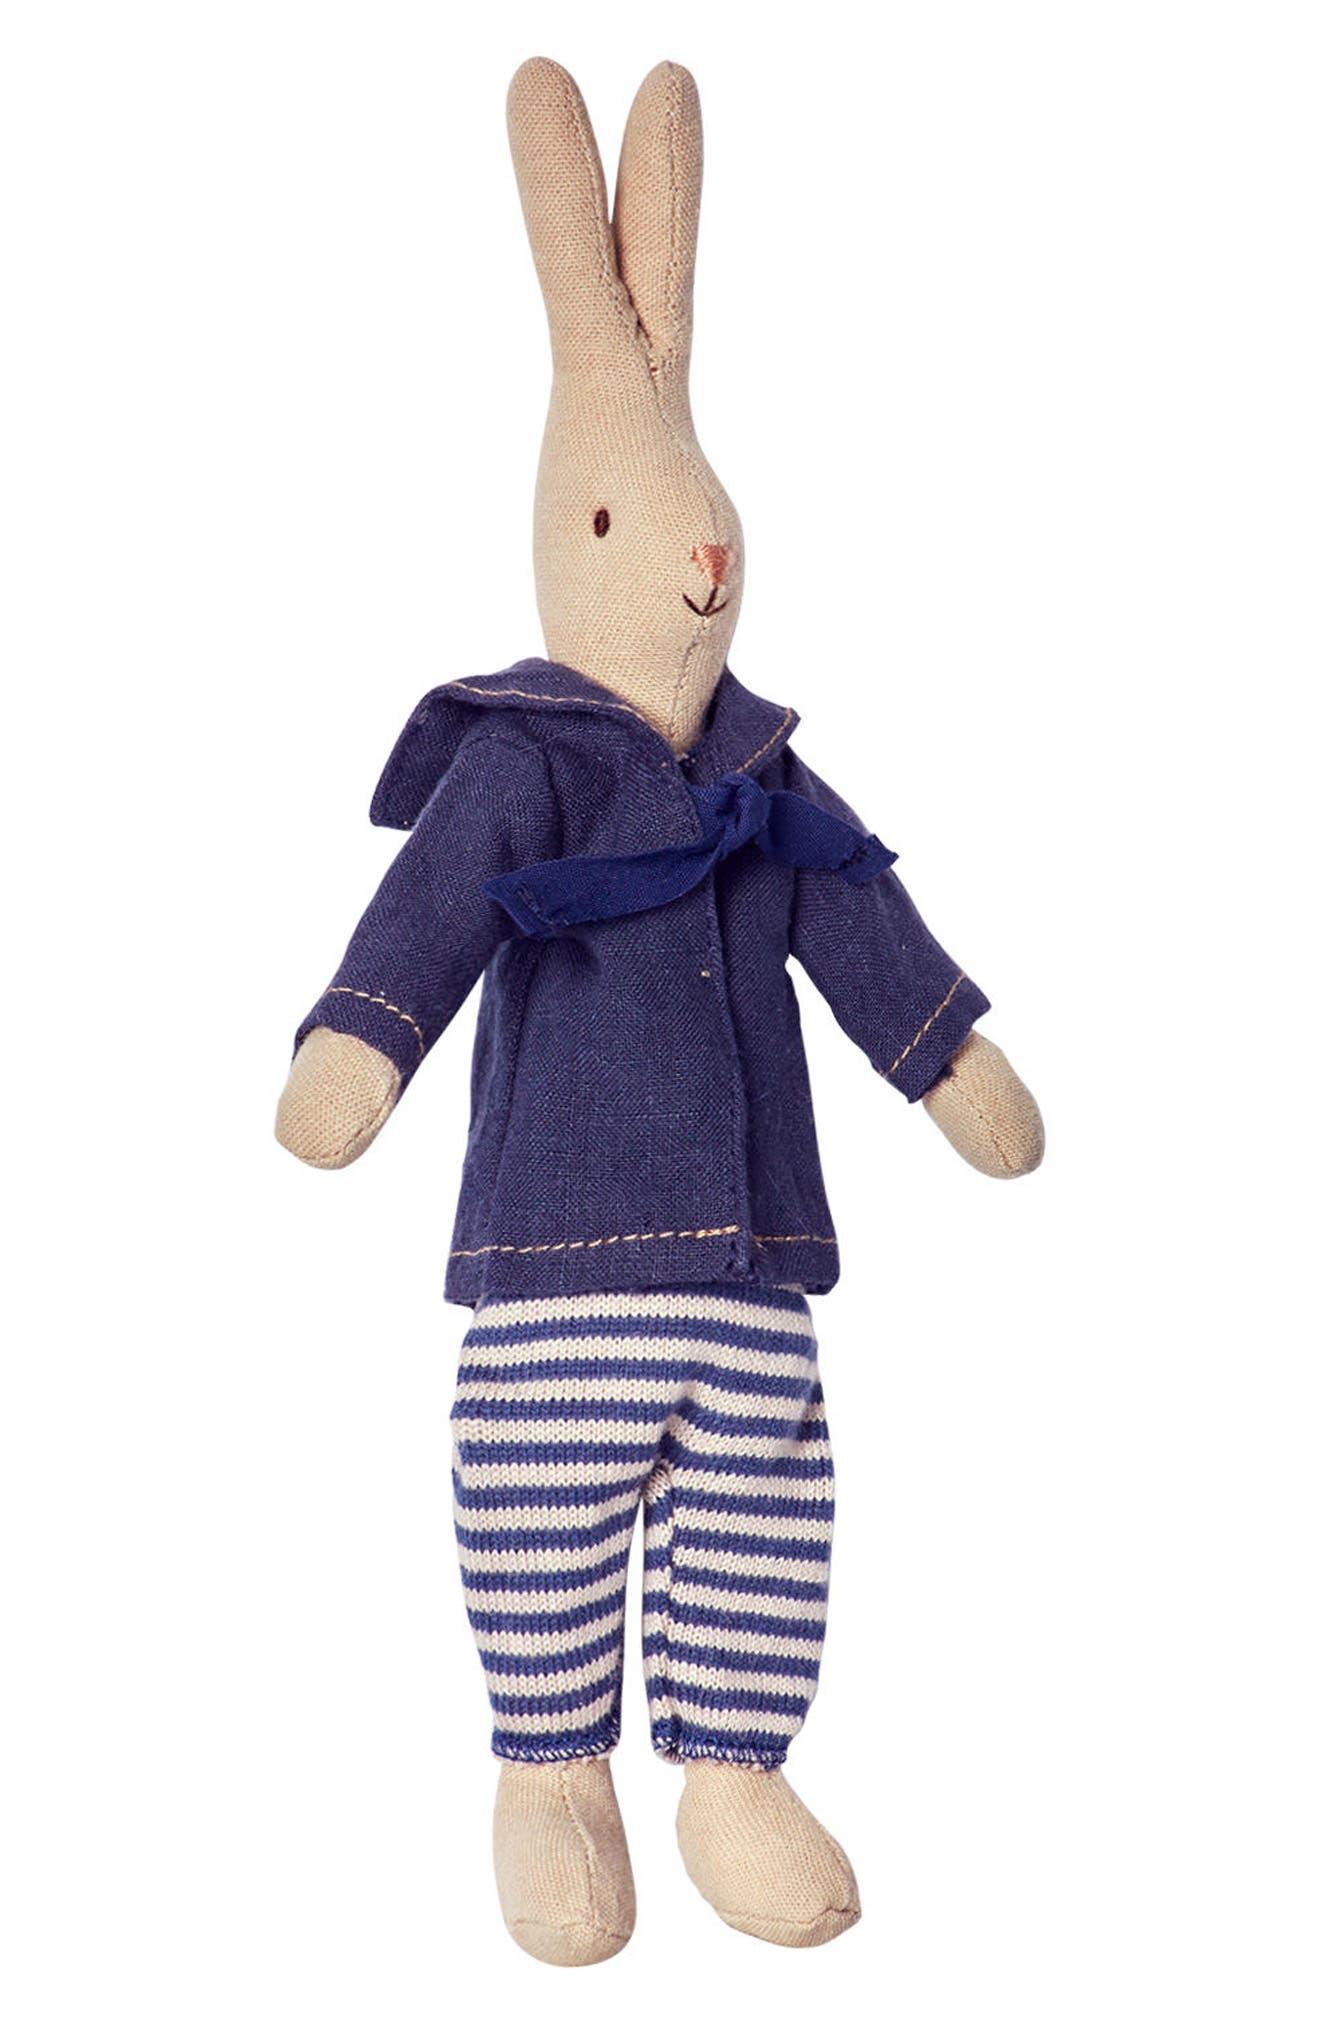 Mini Marcus Rabbit Stuffed Animal,                         Main,                         color, Blue